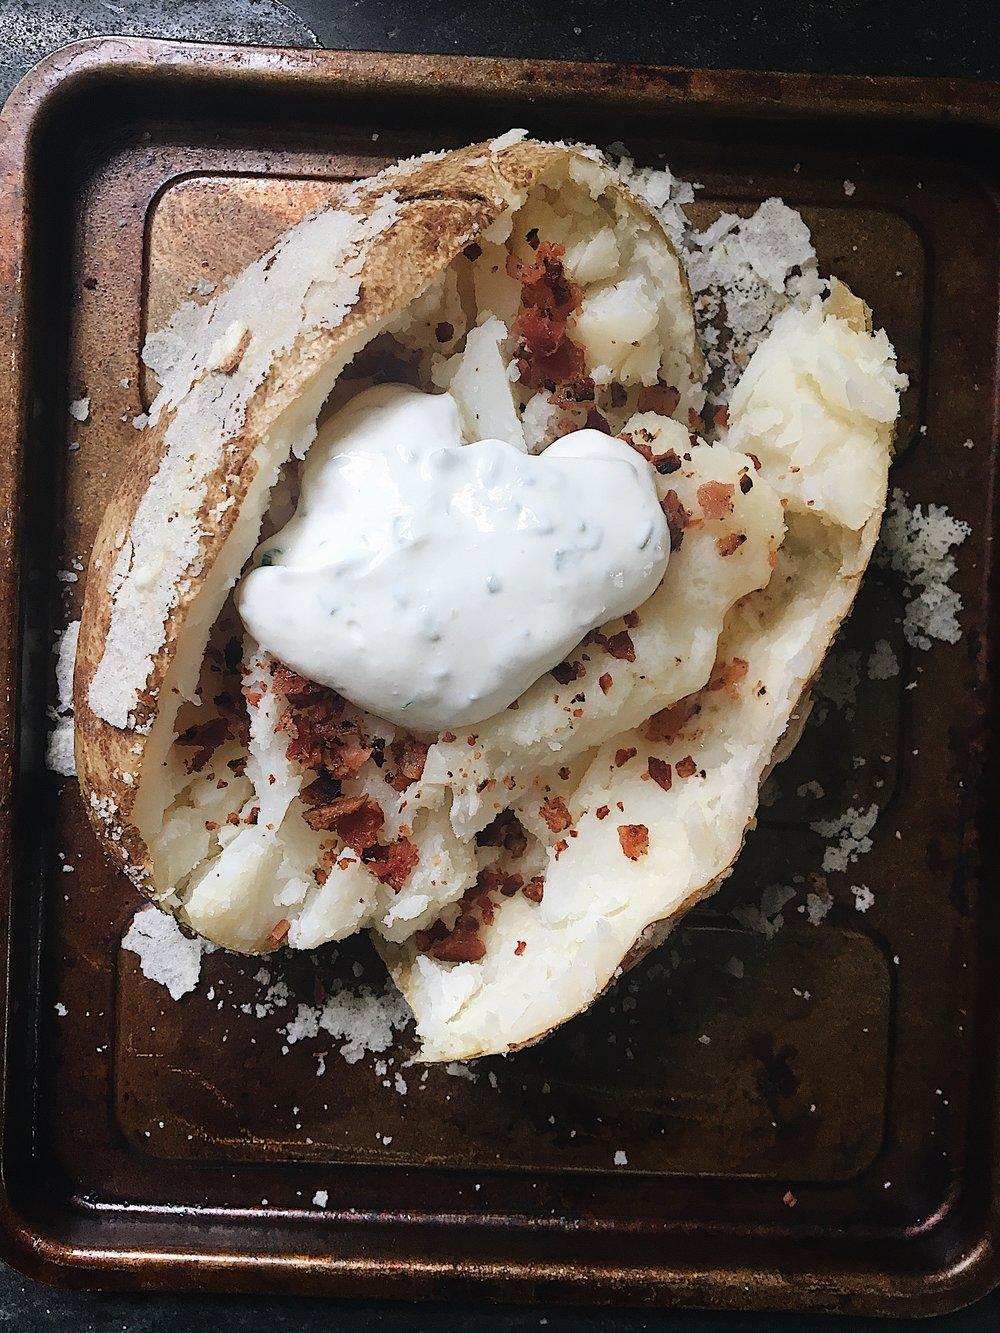 garlicchivesaltcrustedbakedpotato.jpg